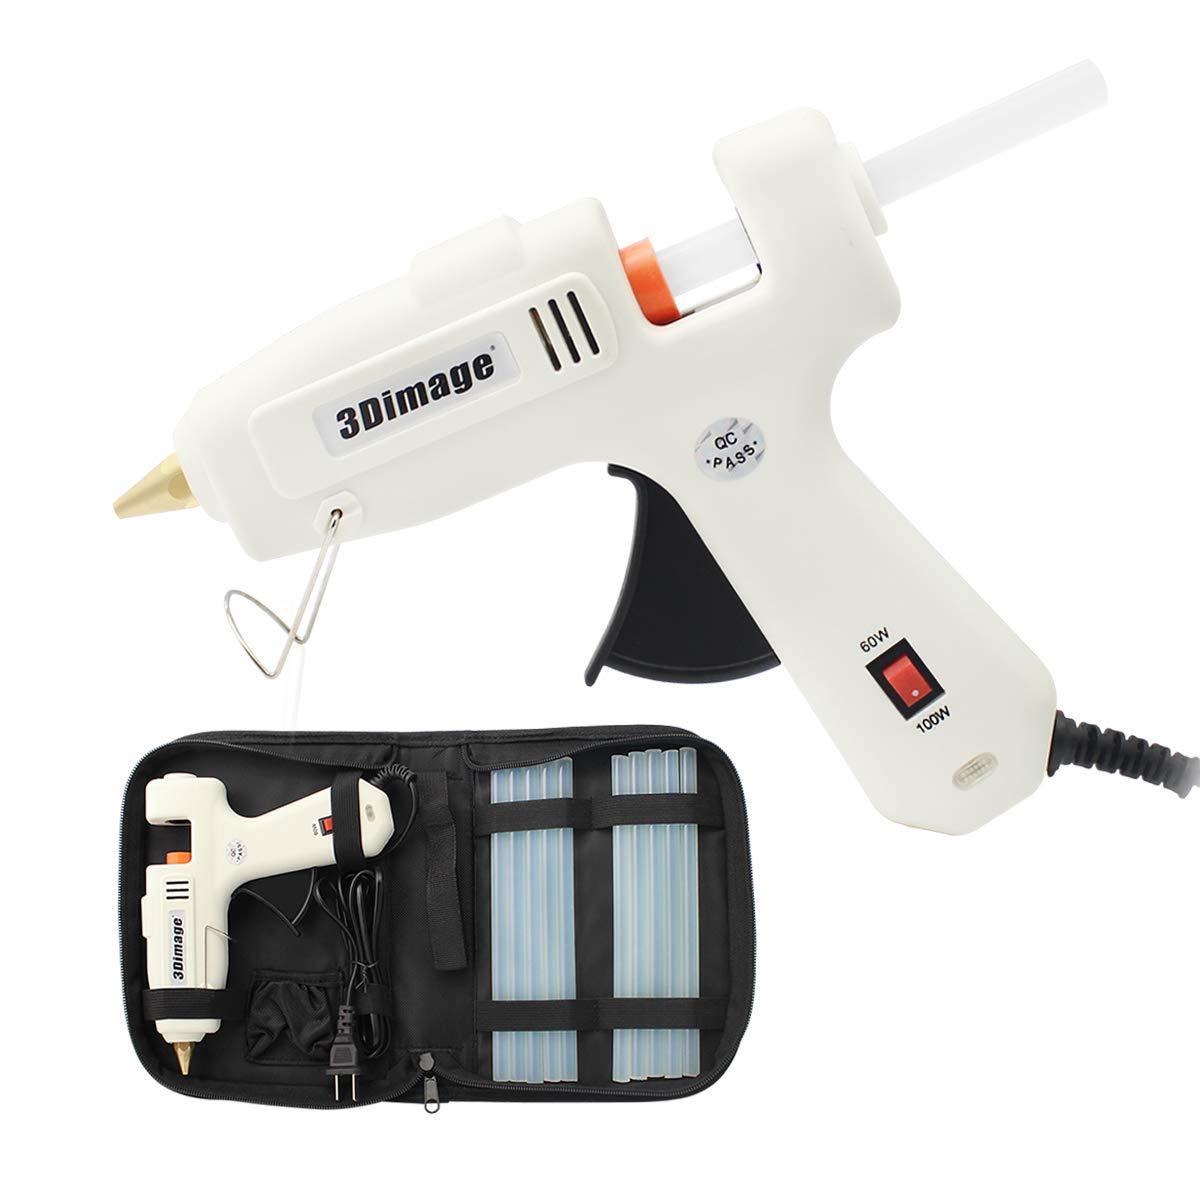 3Dimage Heavy Duty Hot Glue Gun Kit, 60W/100W Dual Power Full Size Hot Glue Gun, 10 Pcs Hi-Temp Melt Glue Sticks and a Zipper Case for Home Repair Fast, DIY Craft Projects and Life Artistic Creat